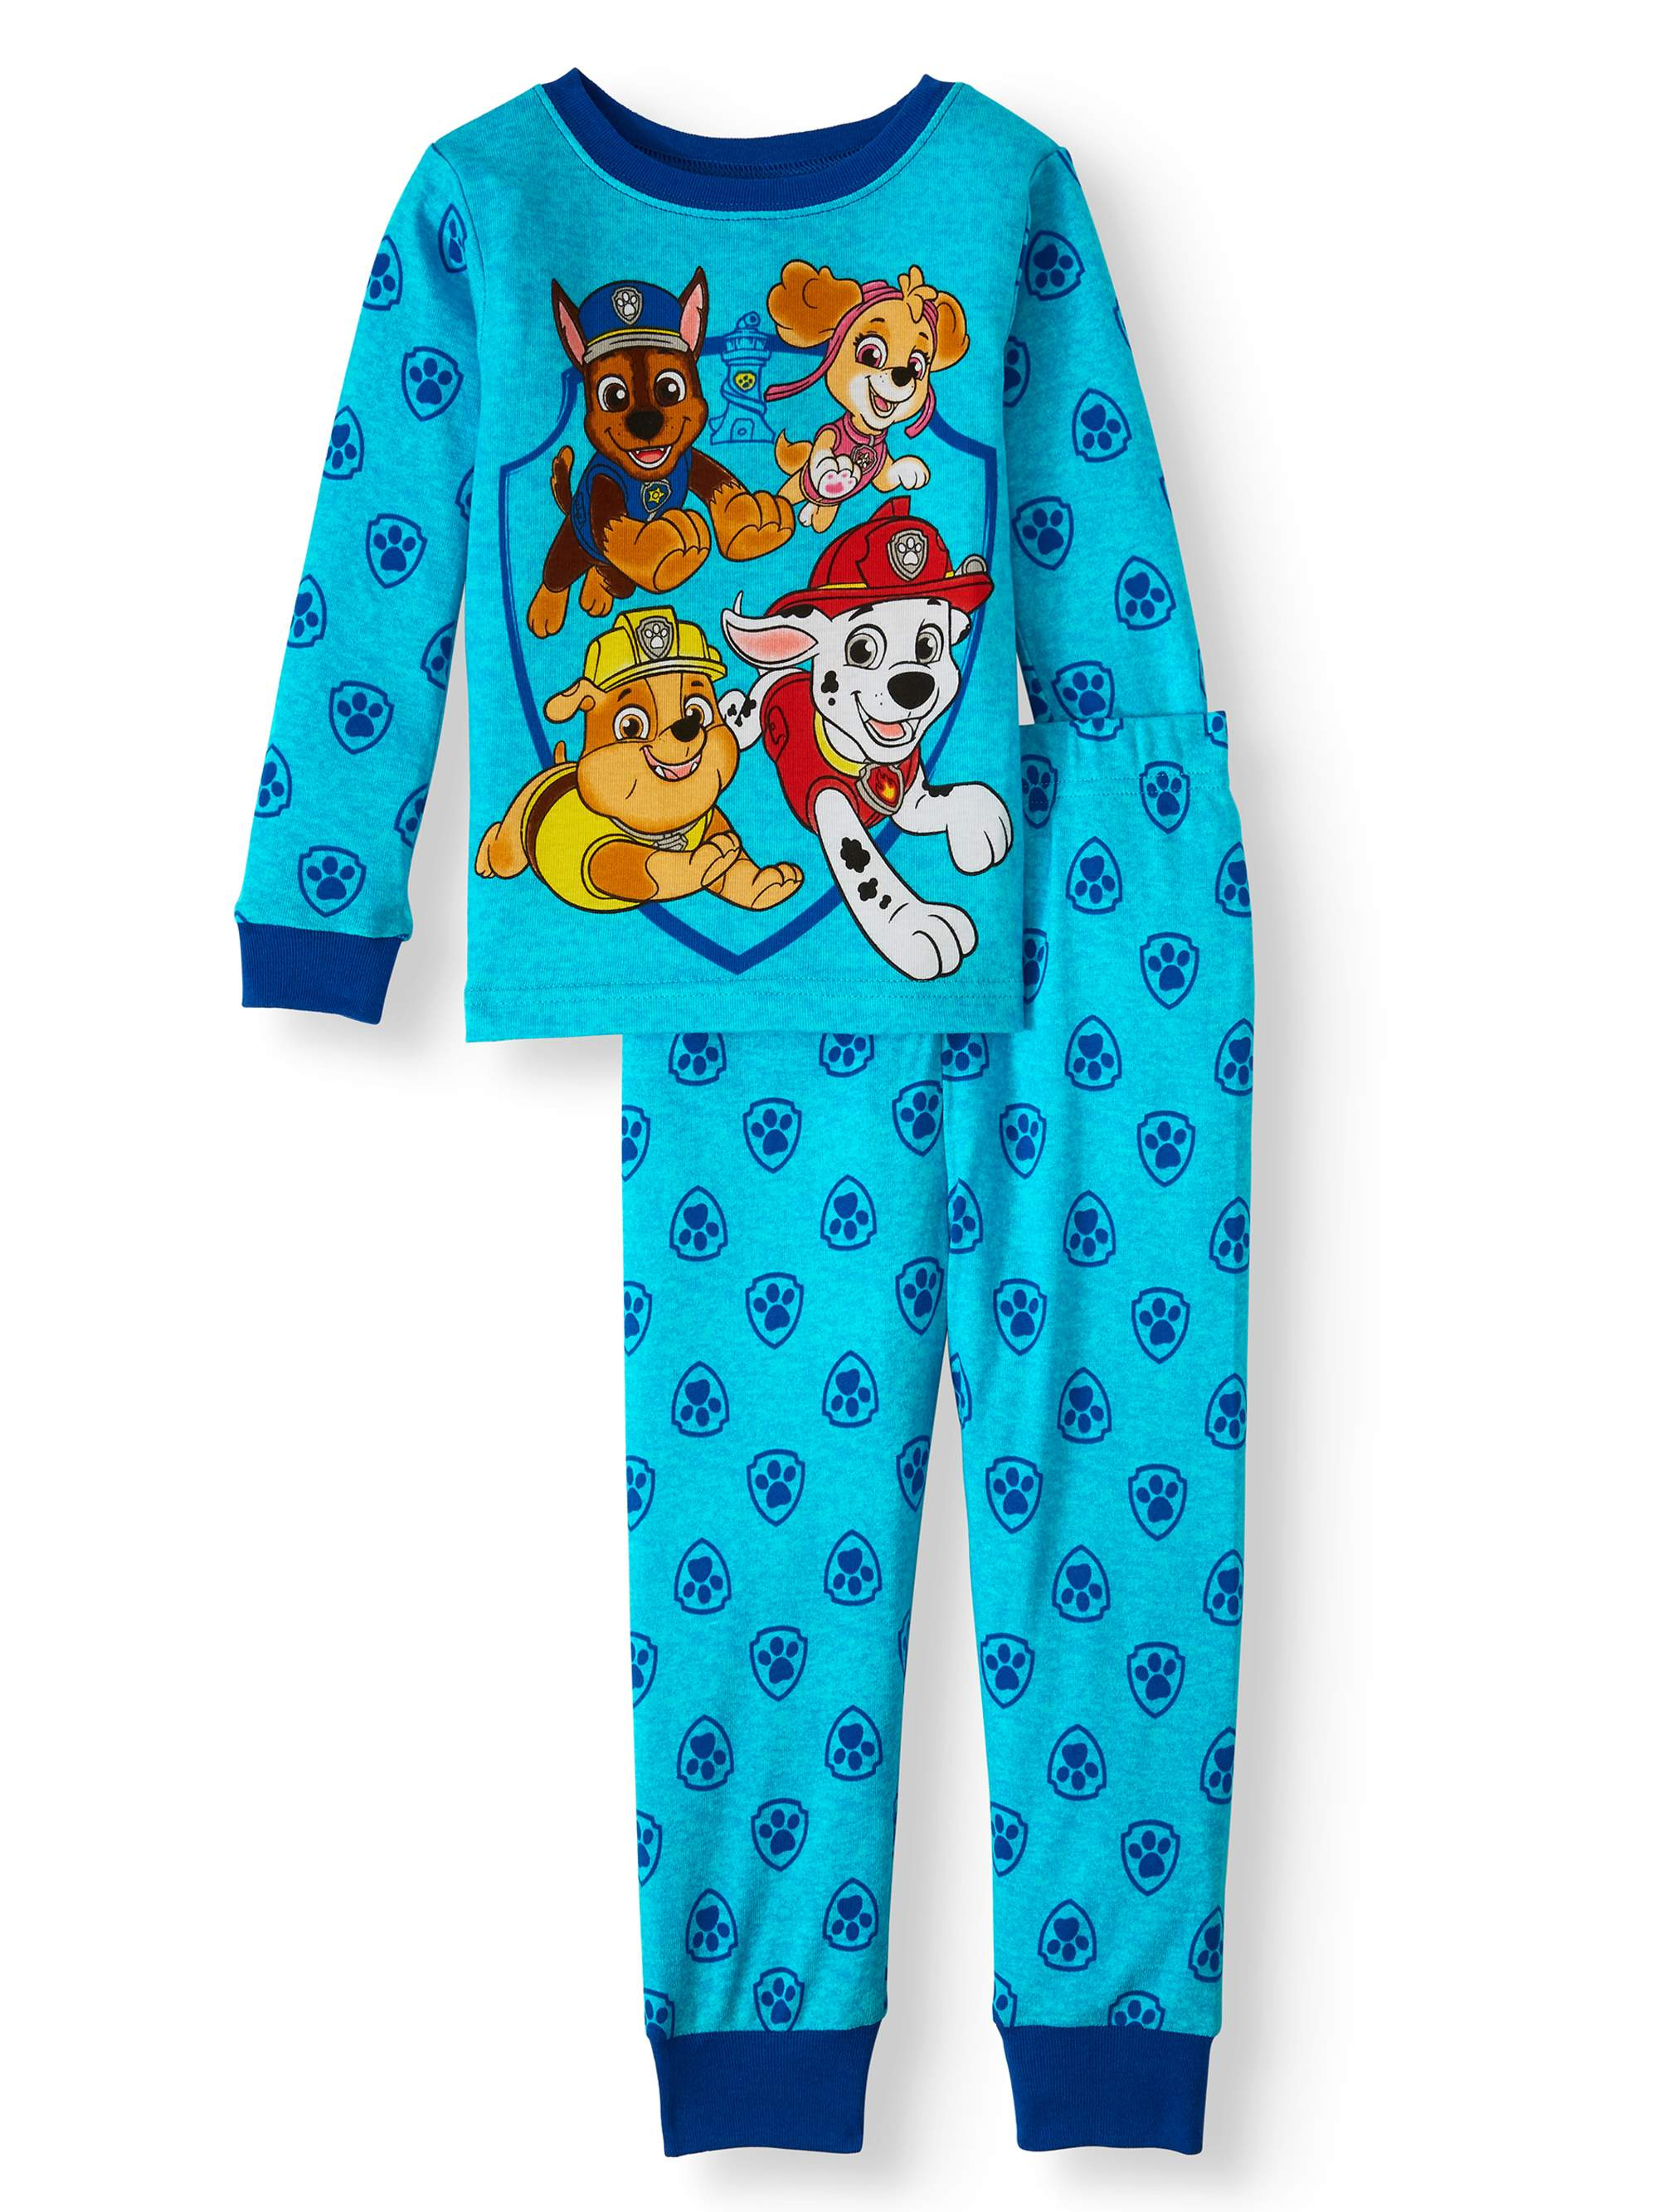 Nickelodeon Paw Patrol Baby Boys Bodysuit Soft Cotton